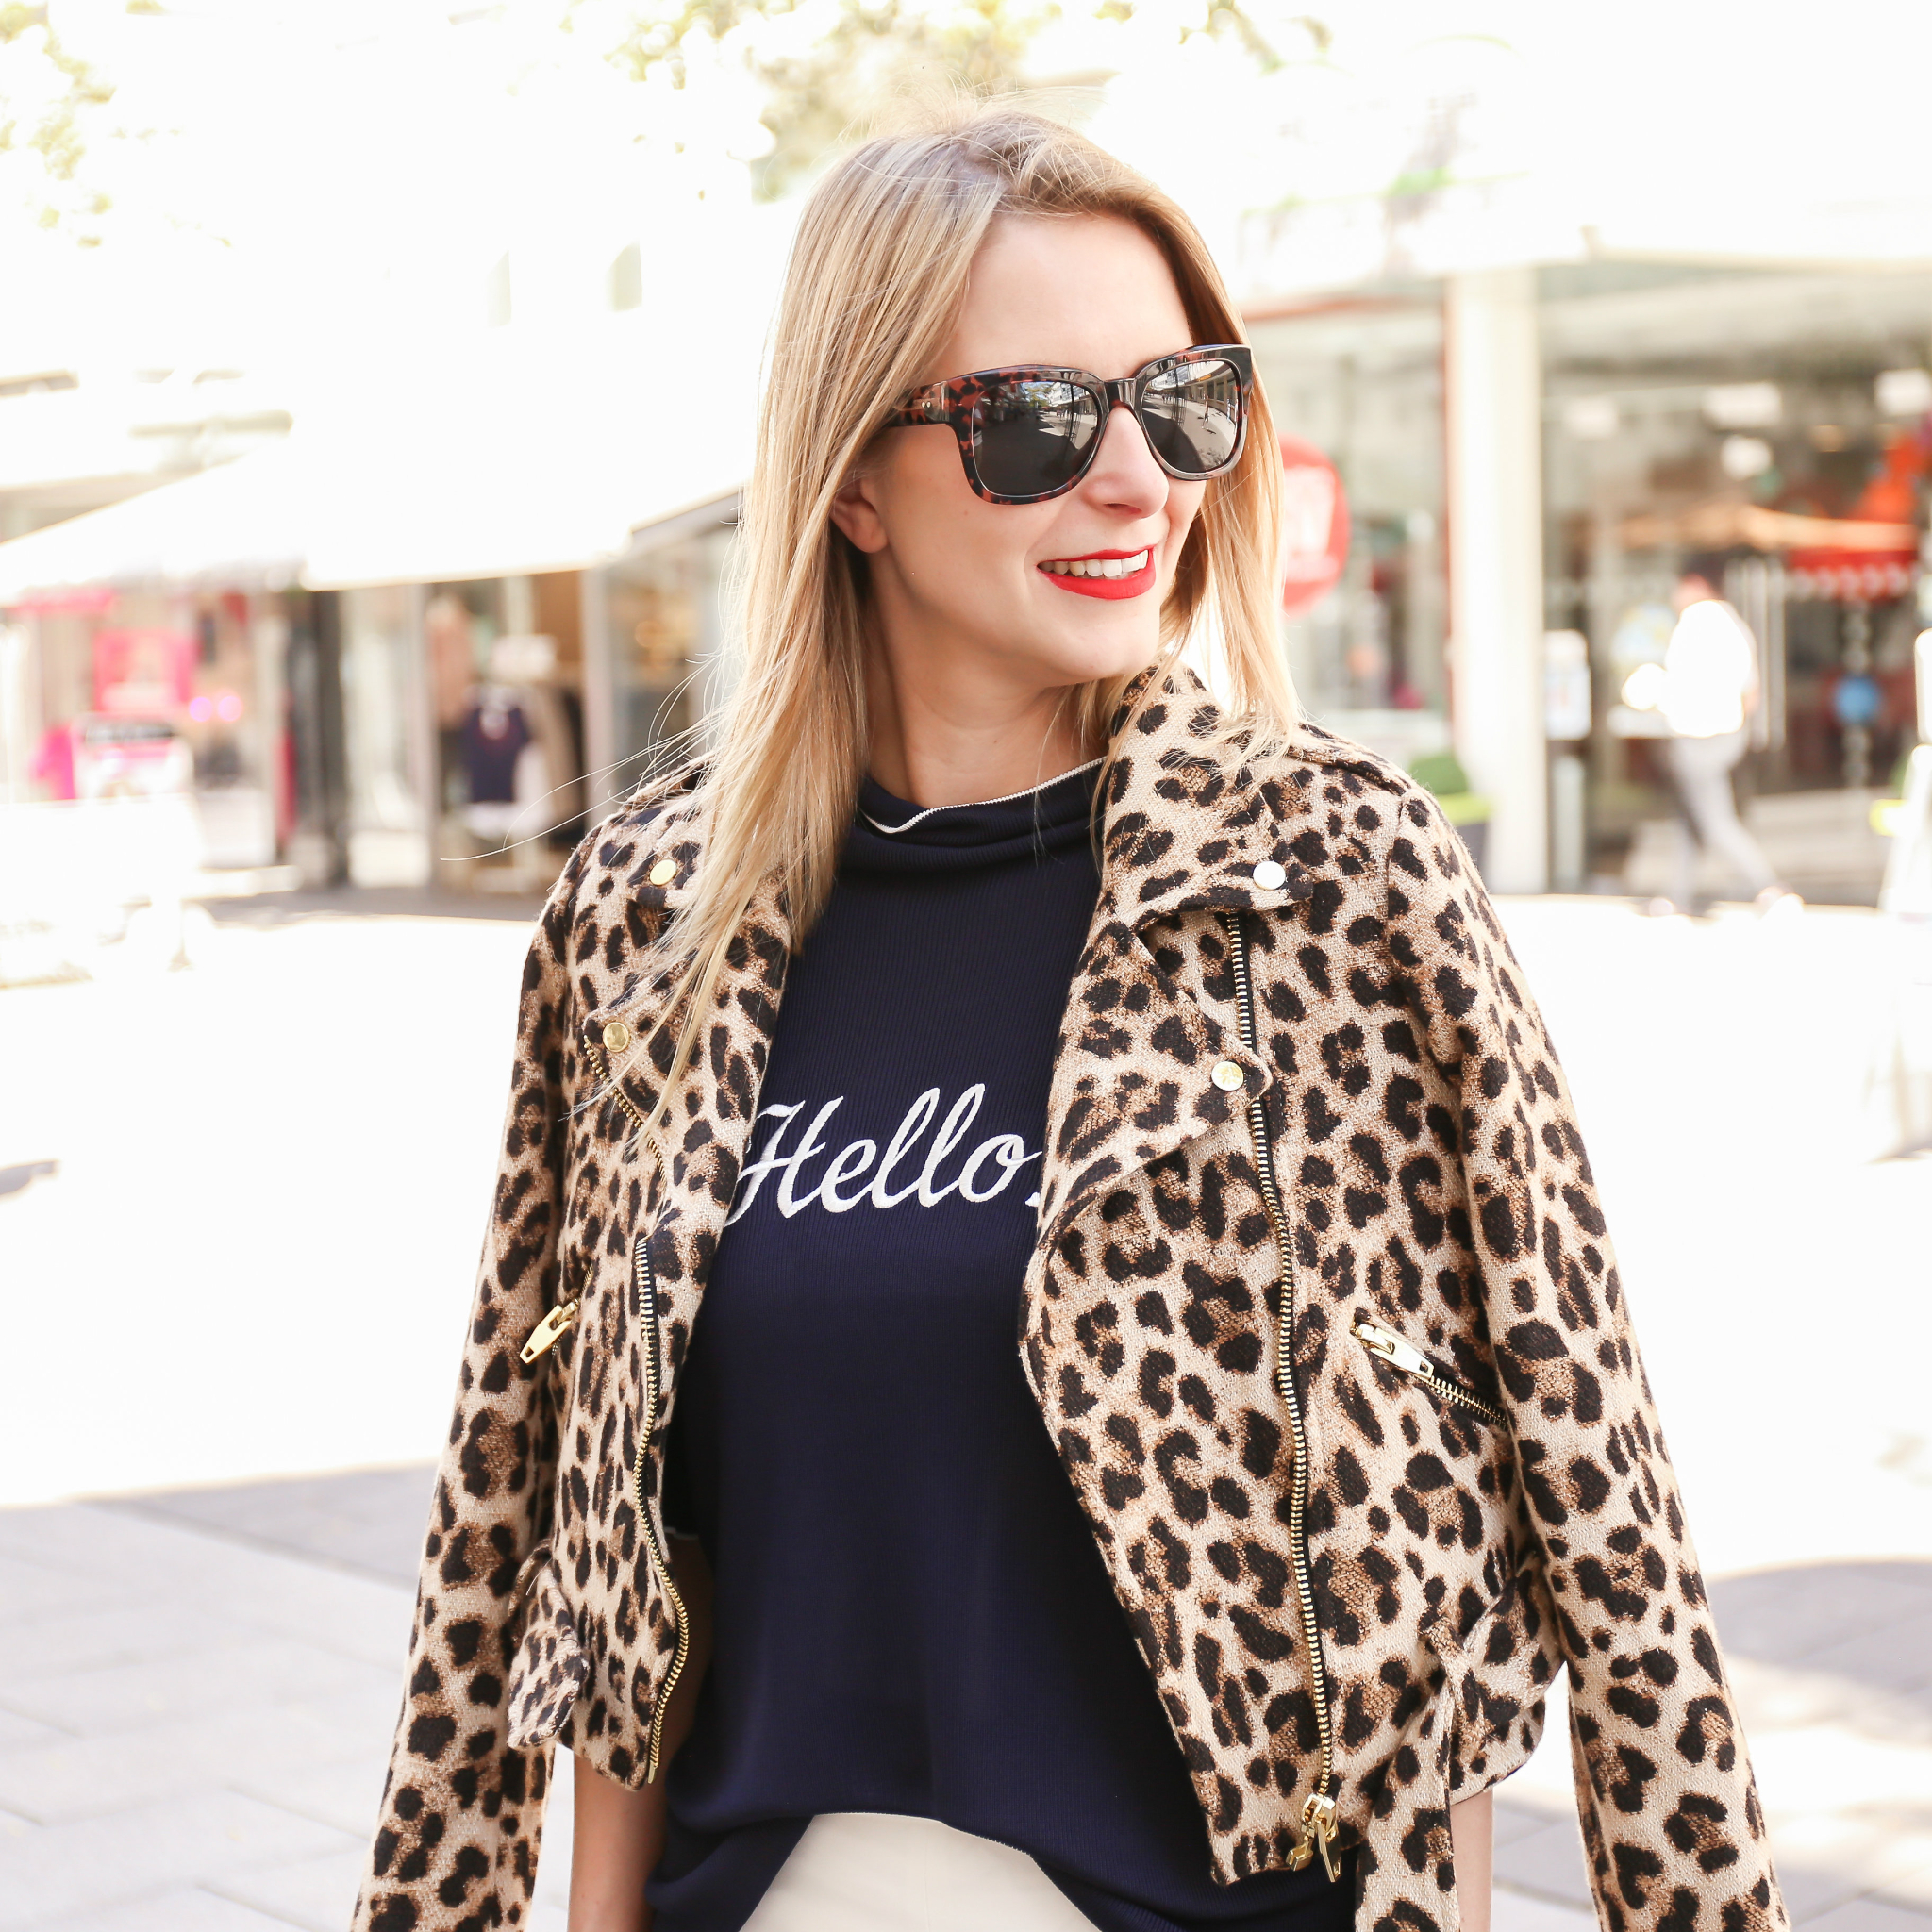 MOD-by-Monique-Looks-Leopard-Print-Gucci-Slipper-19